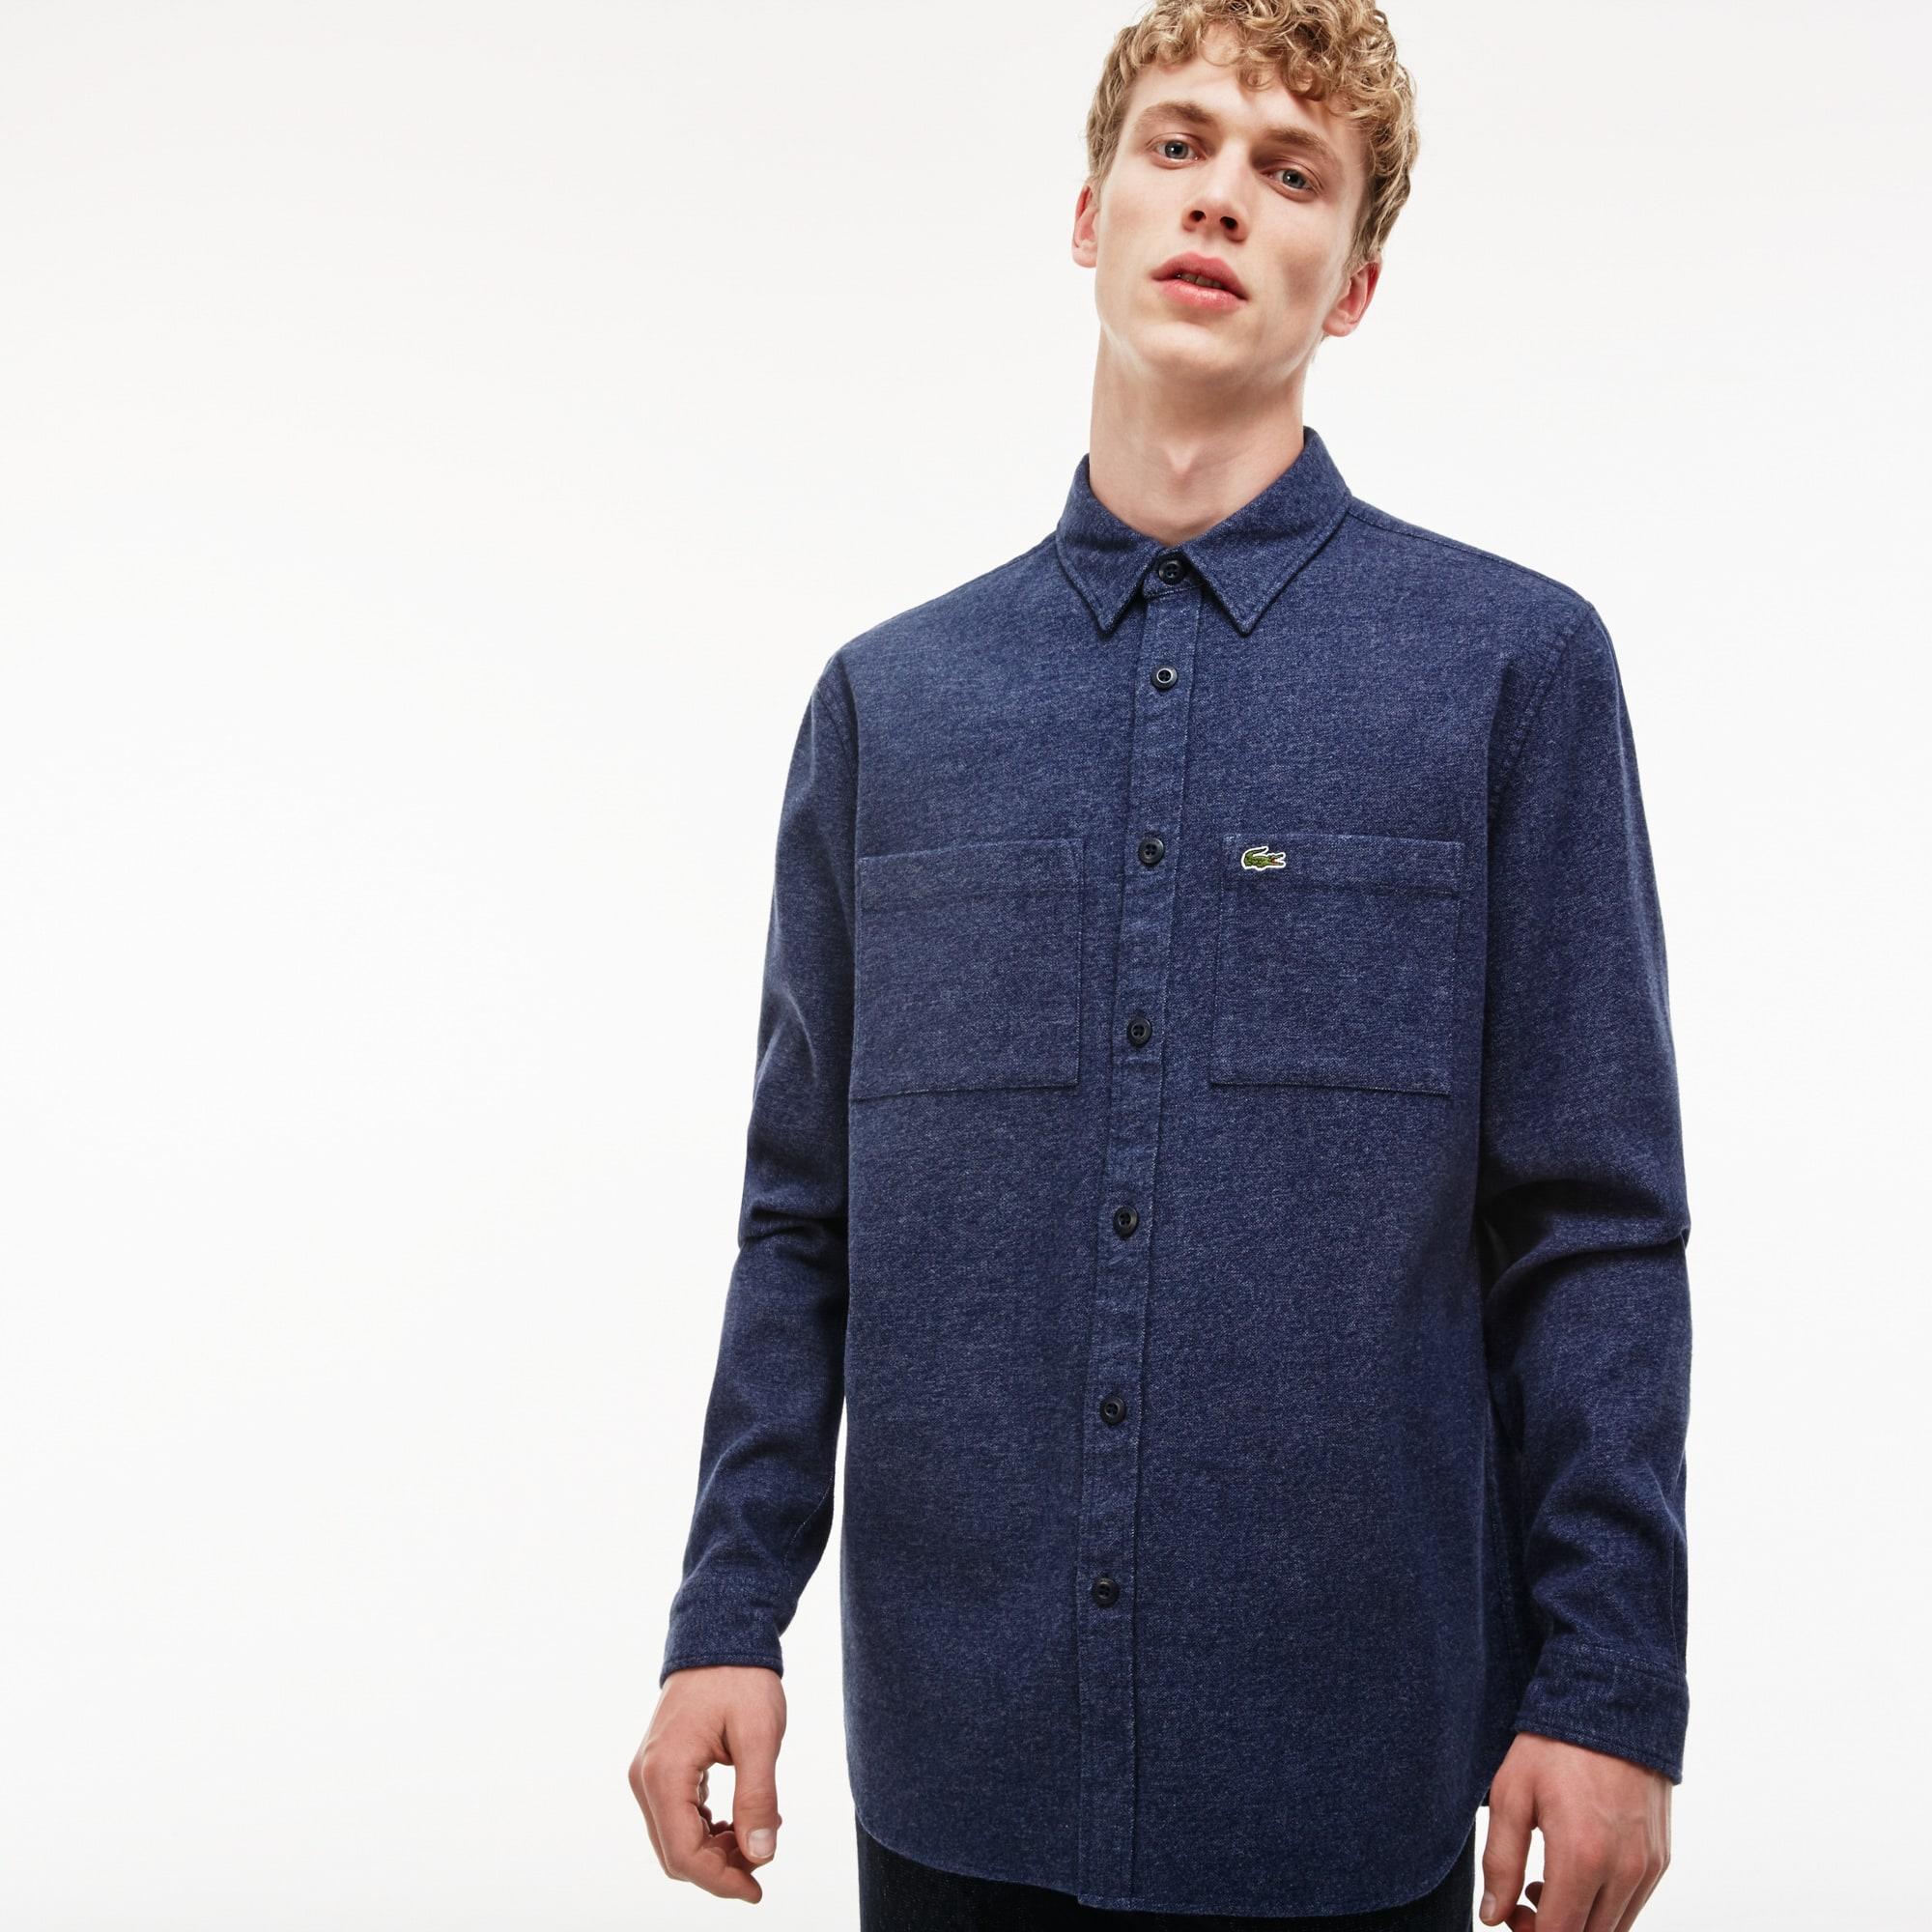 Men's Regular Fit Heather-Effect Flannel Shirt With Pockets